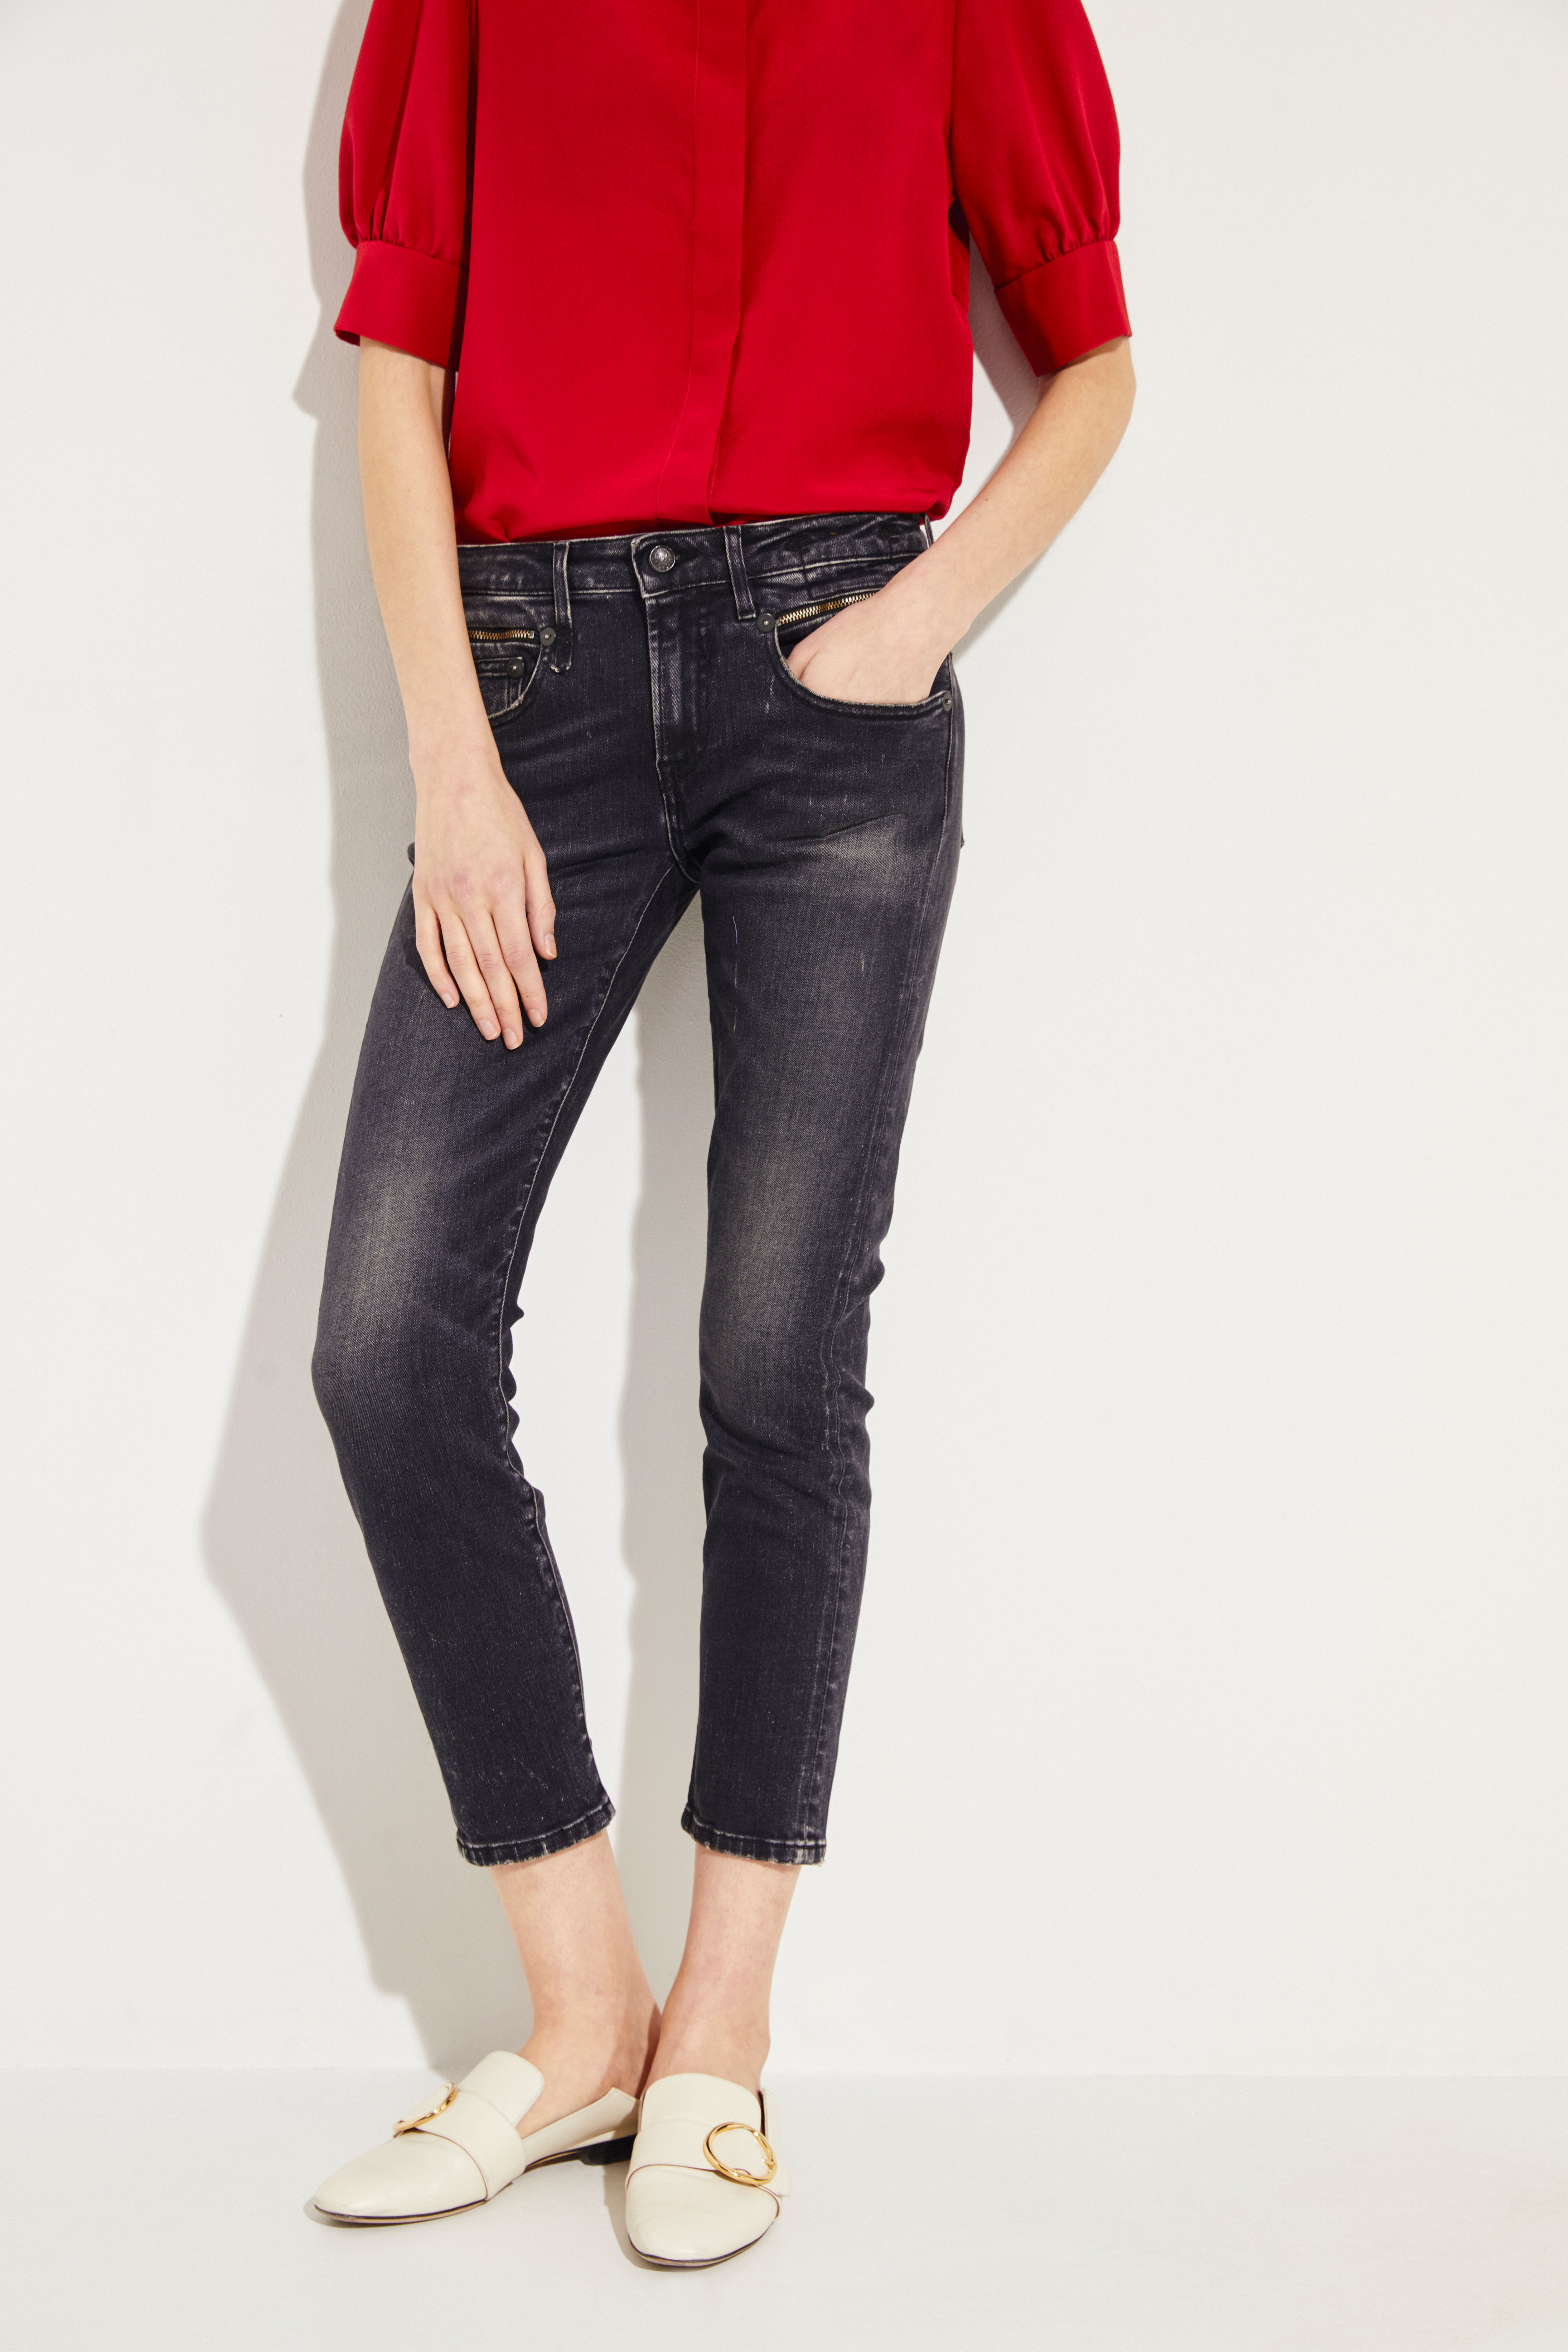 2495654ce1bf6 Jeans 'Biker Boy' Black | Straight Leg Jeans | Jeans | Clothing |  unger-fashion.com